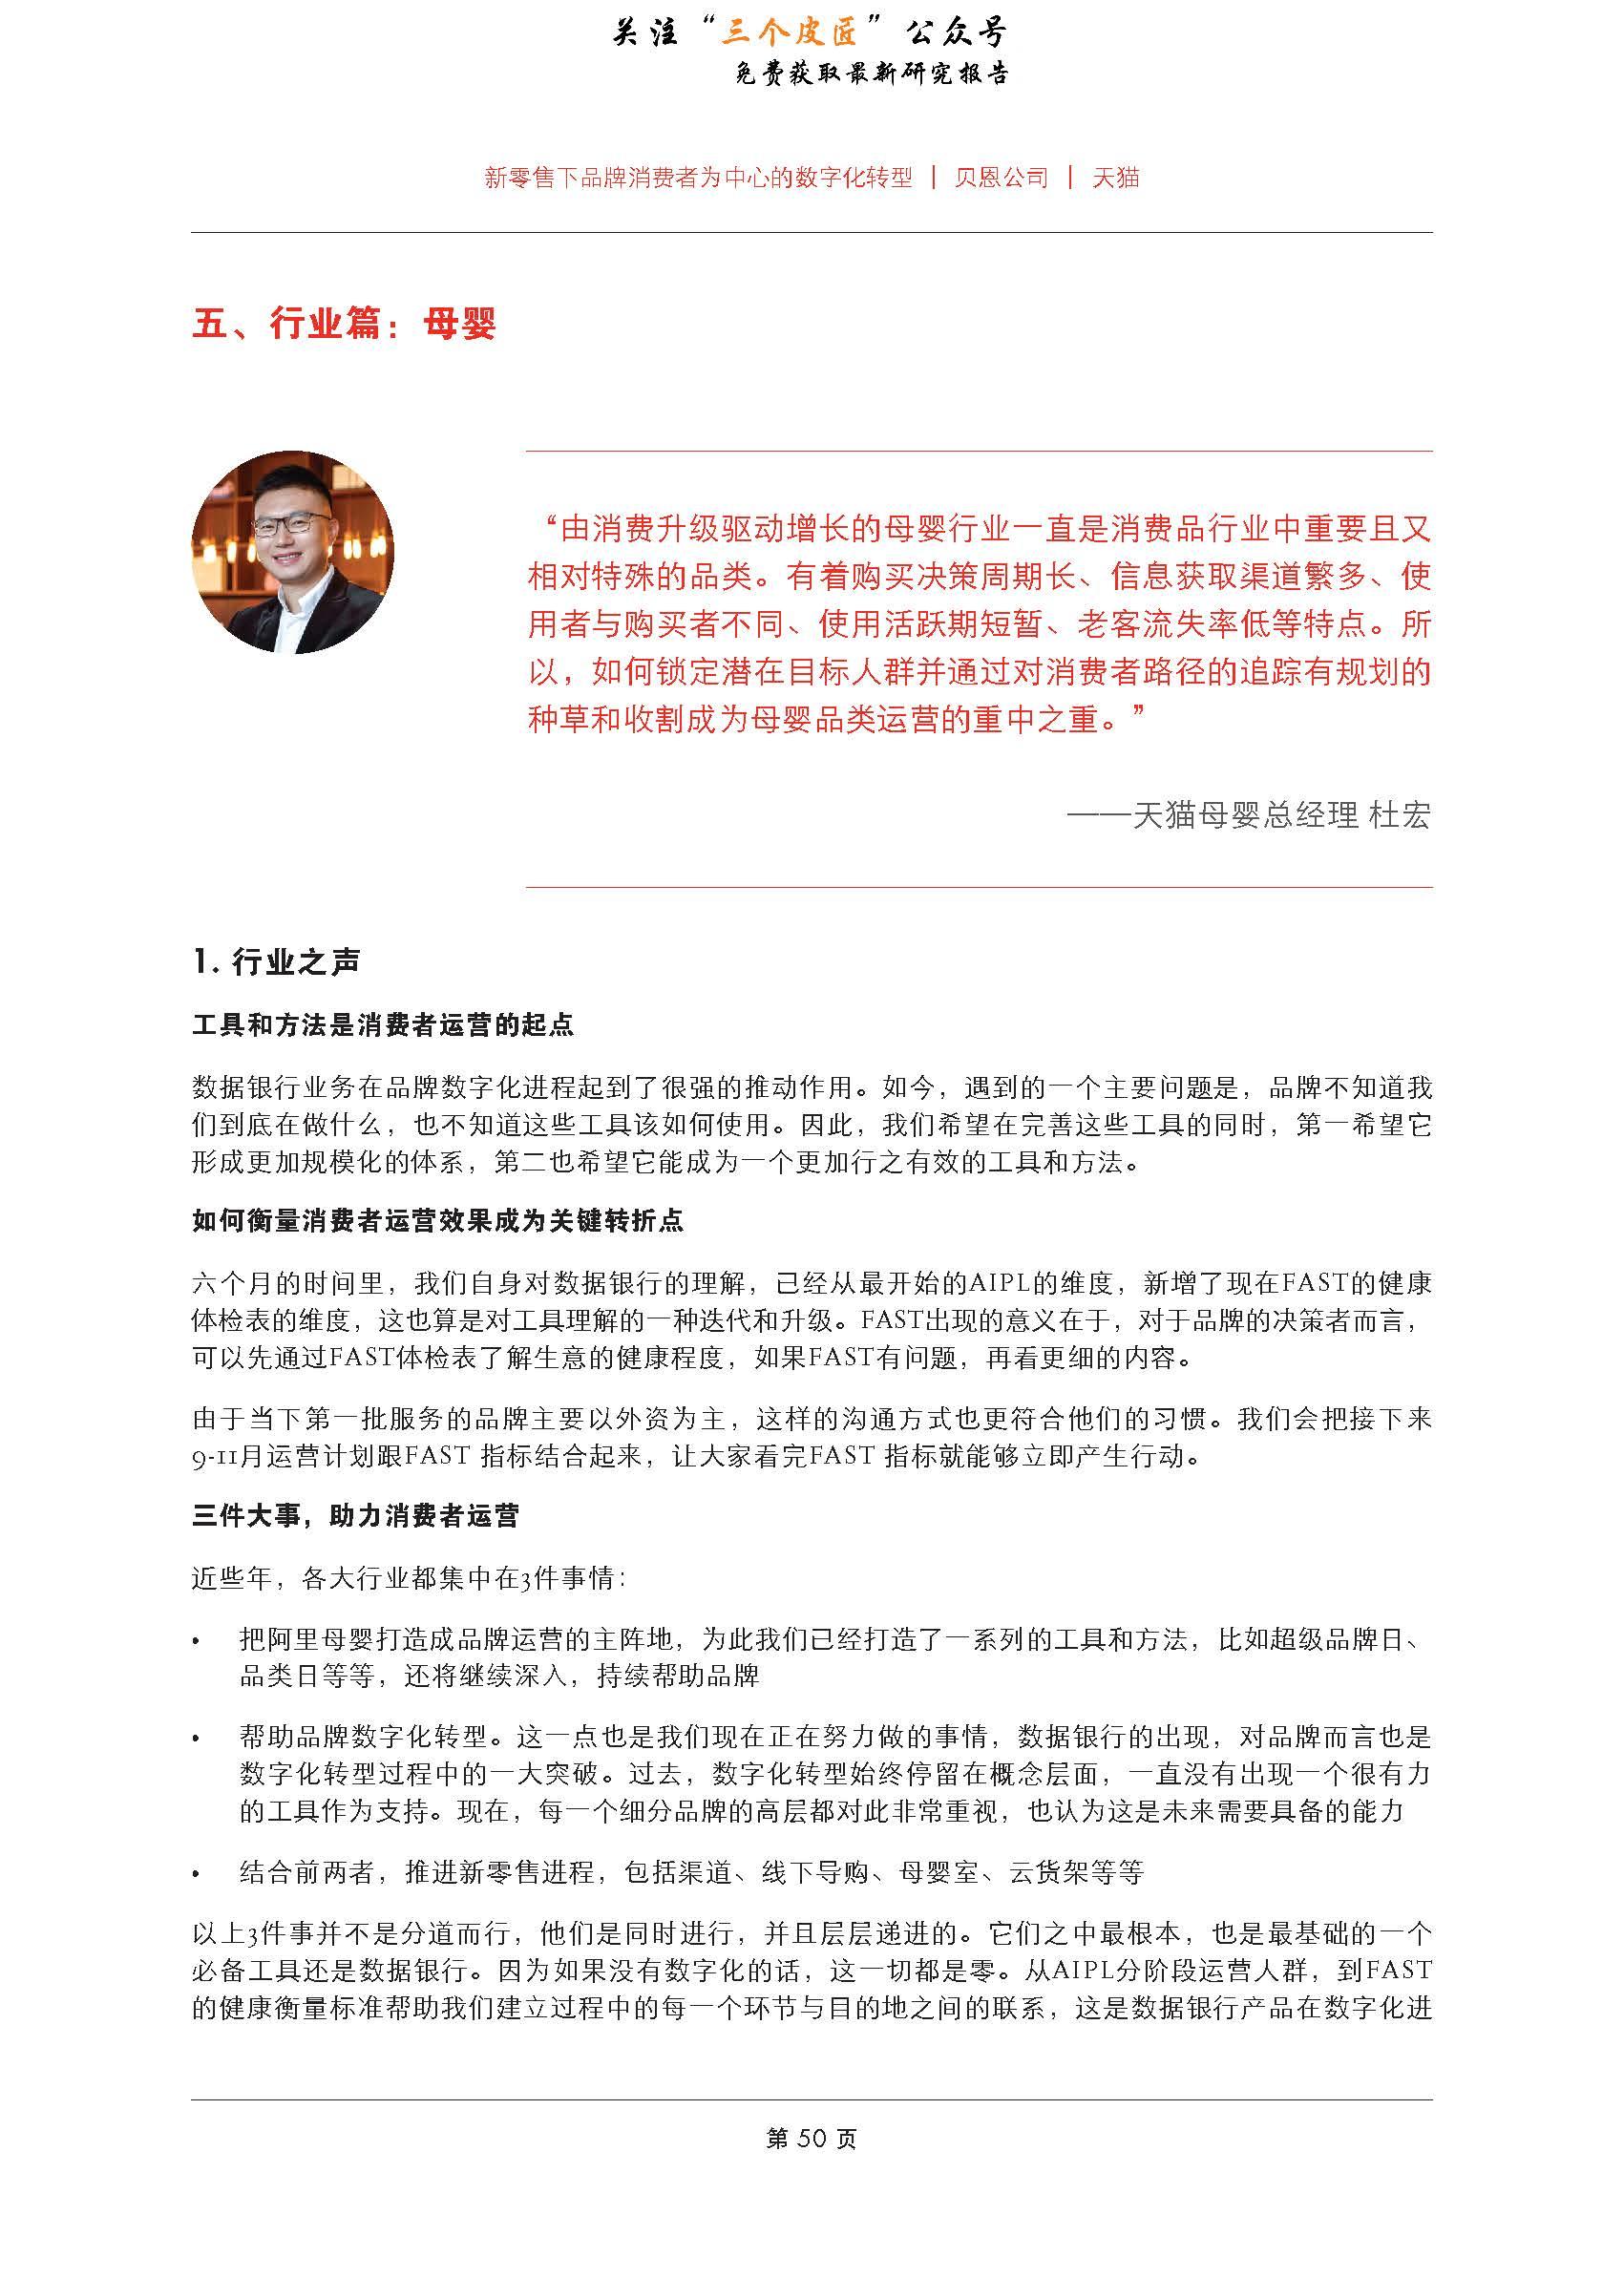 1_Page_52.jpg